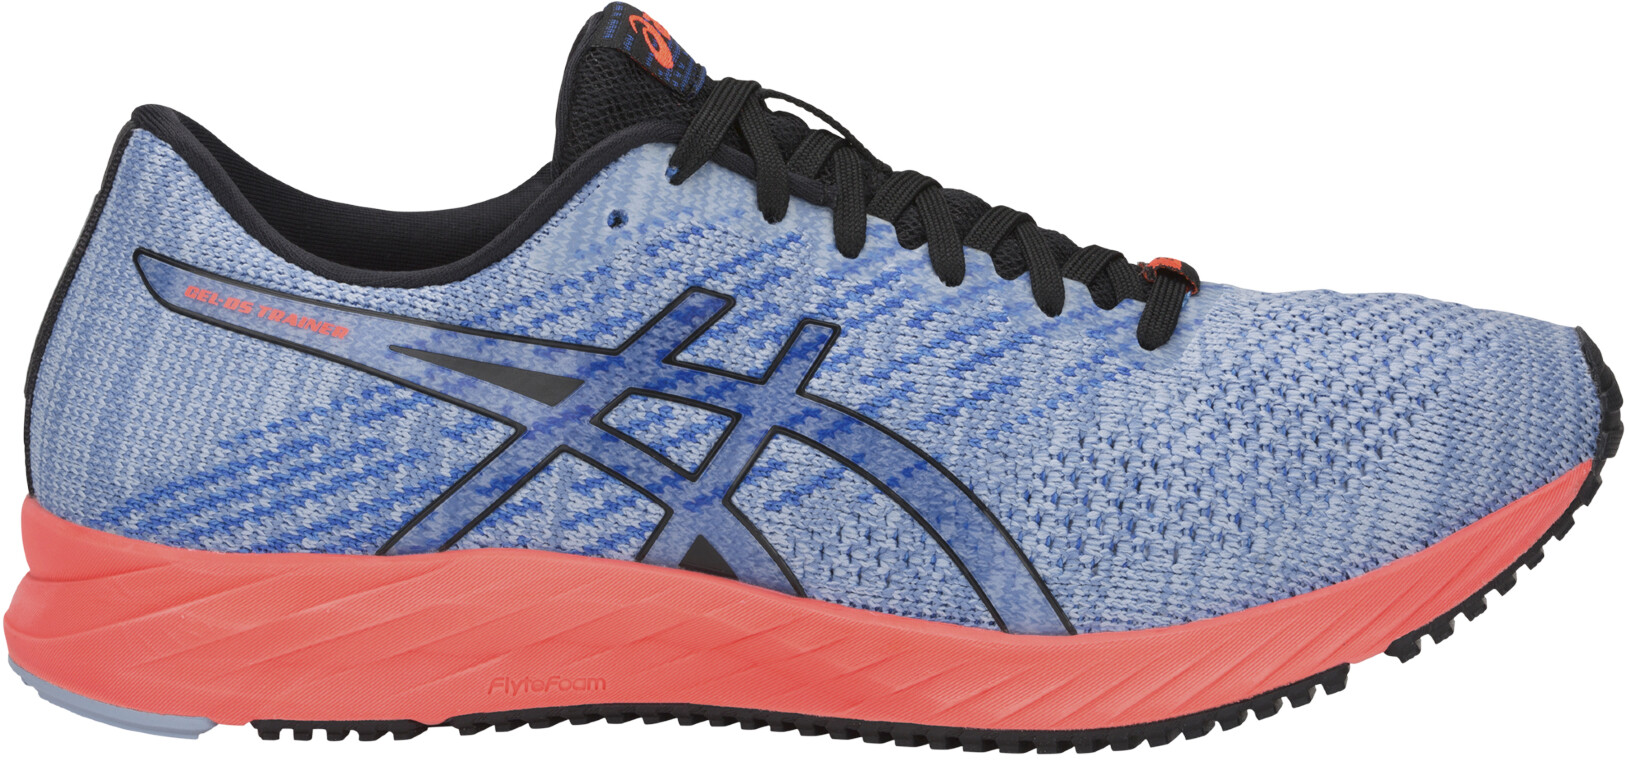 6badcece3 asics Gel-DS Trainer 24 - Zapatillas running Mujer - azul